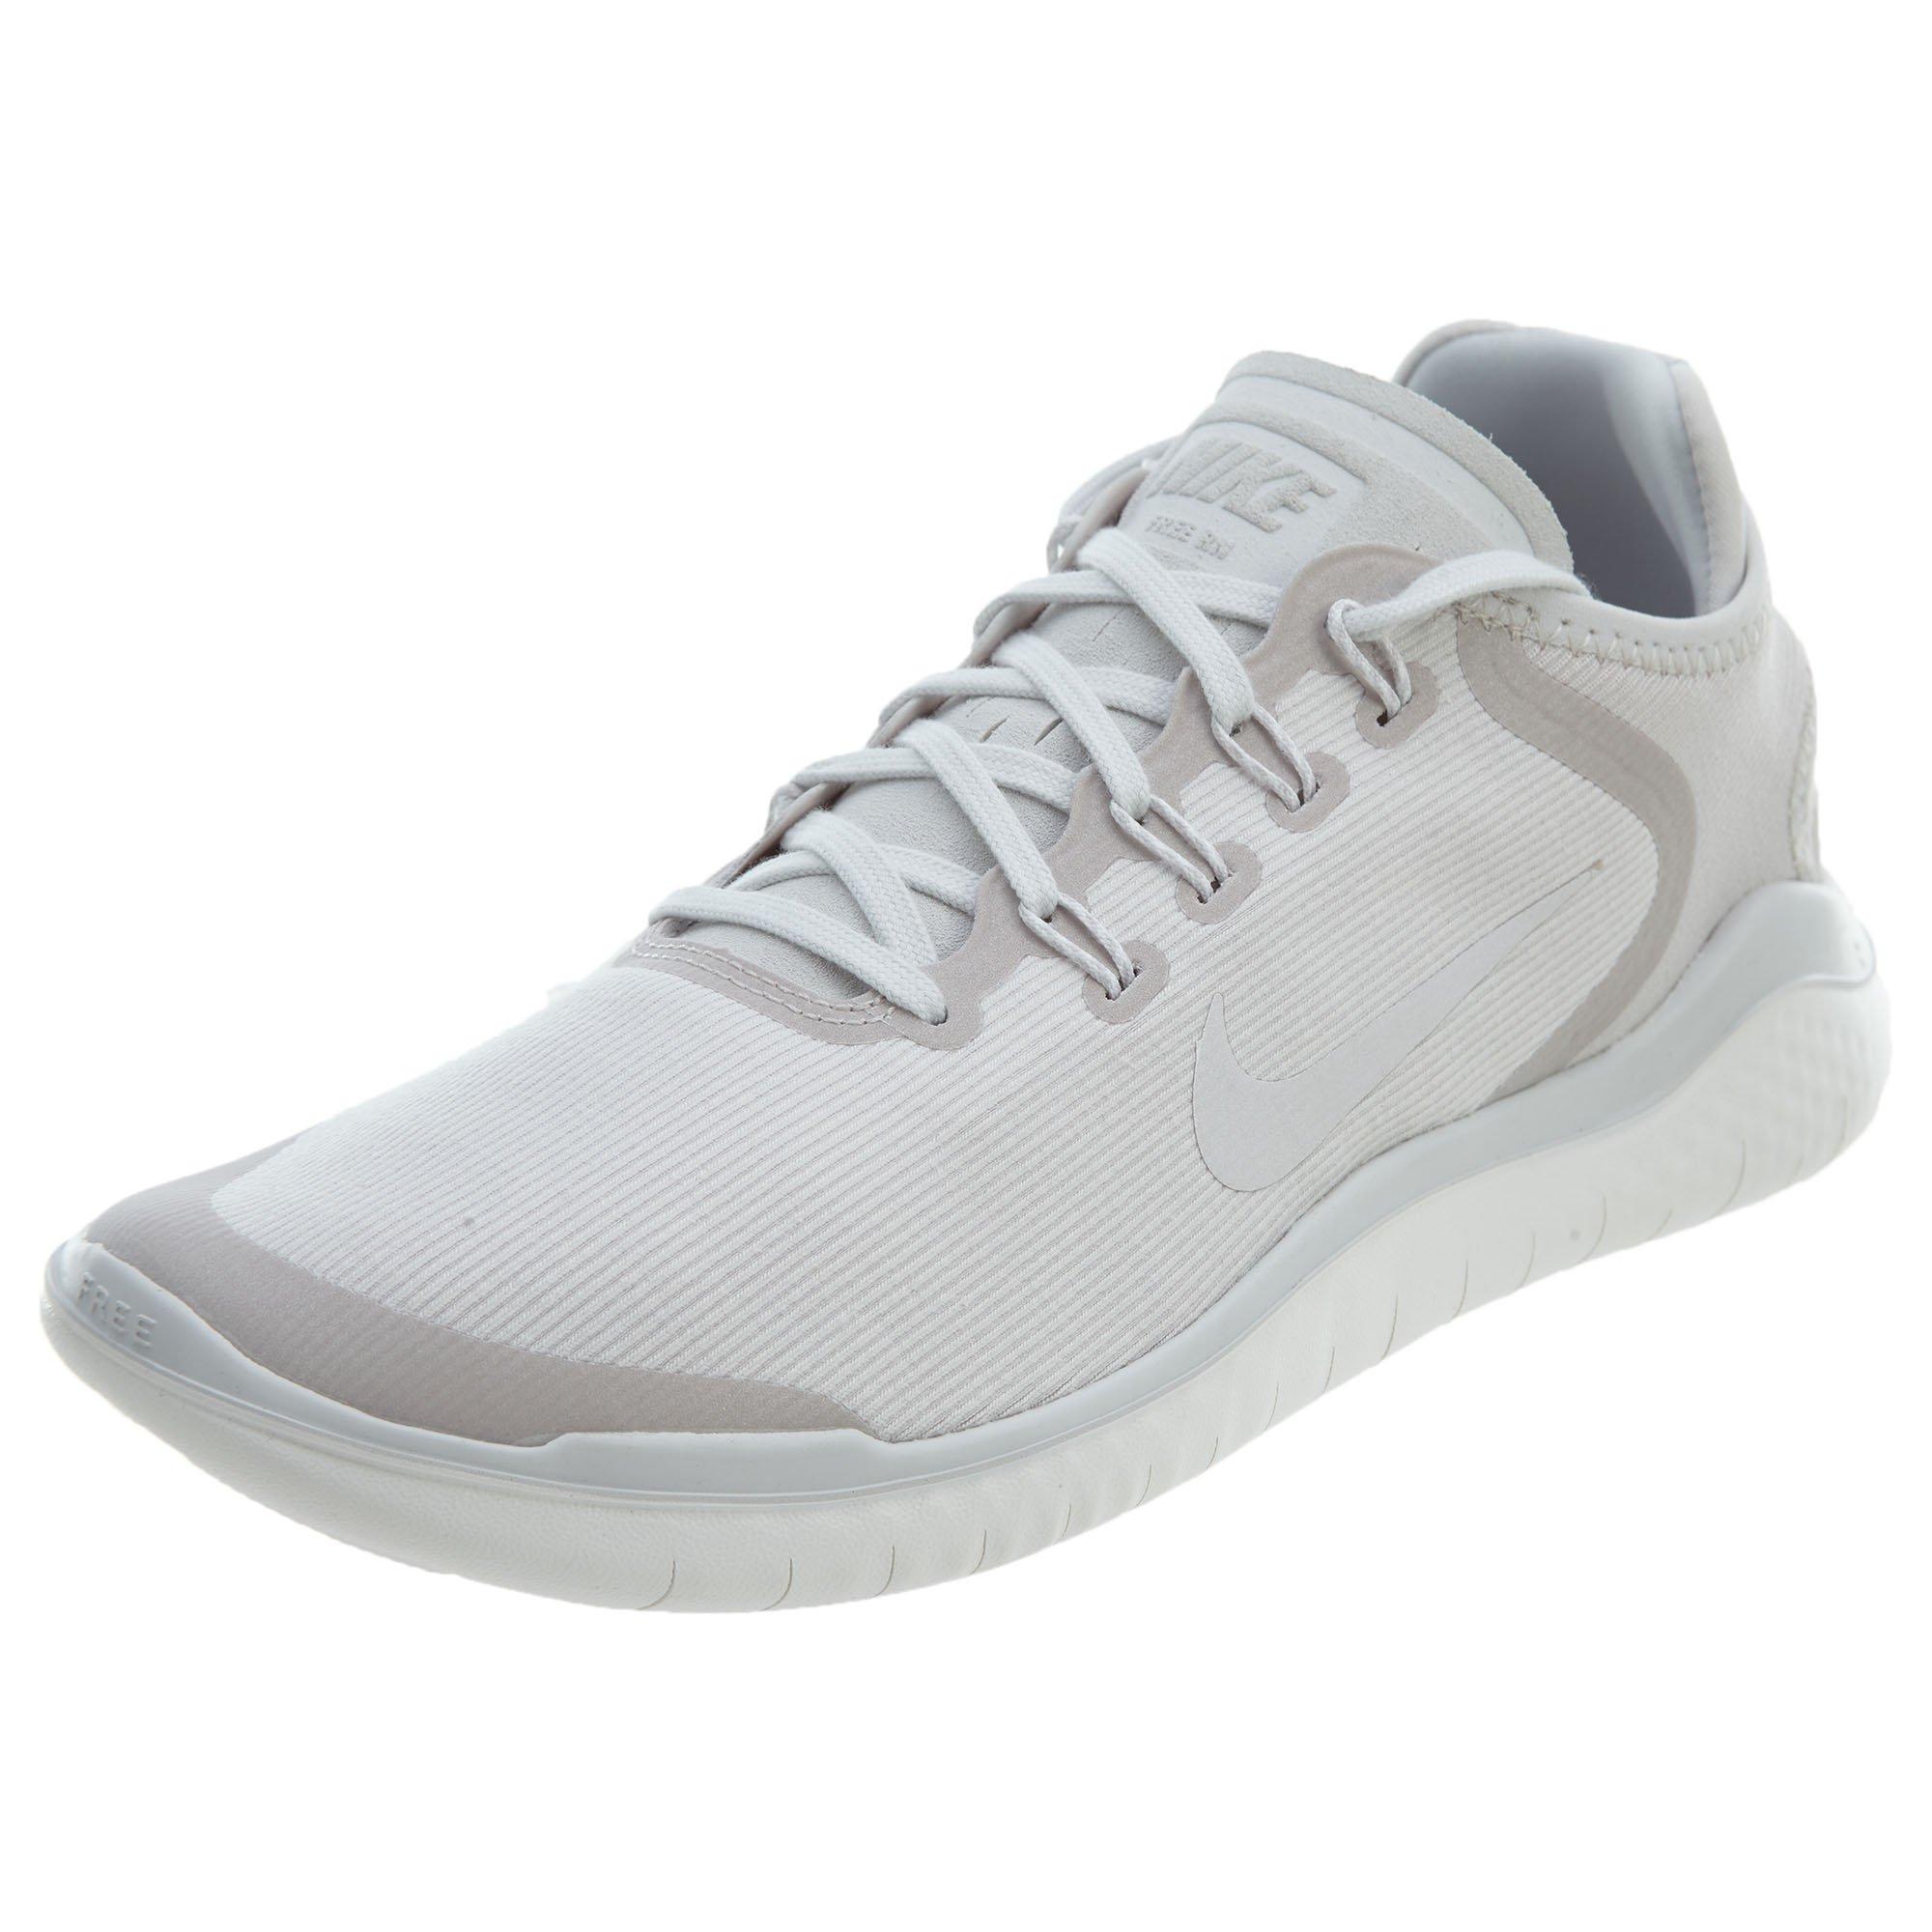 4cc6be627159 Galleon - NIKE Men s Free Rn 2018 Running Shoe (Vast Grey Summit White)